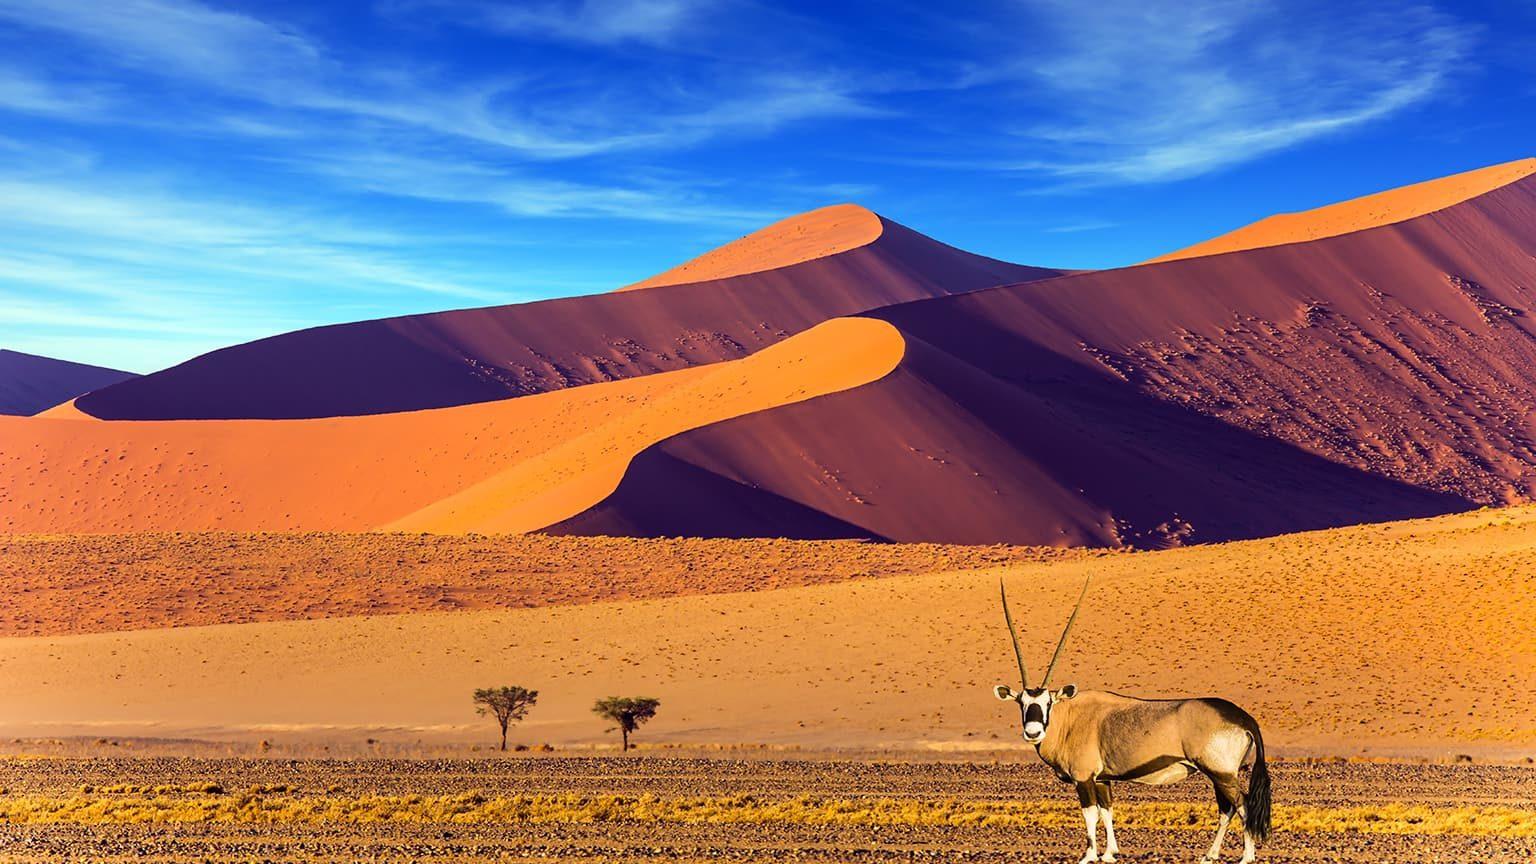 Oryx standing at the road, Namib Desert